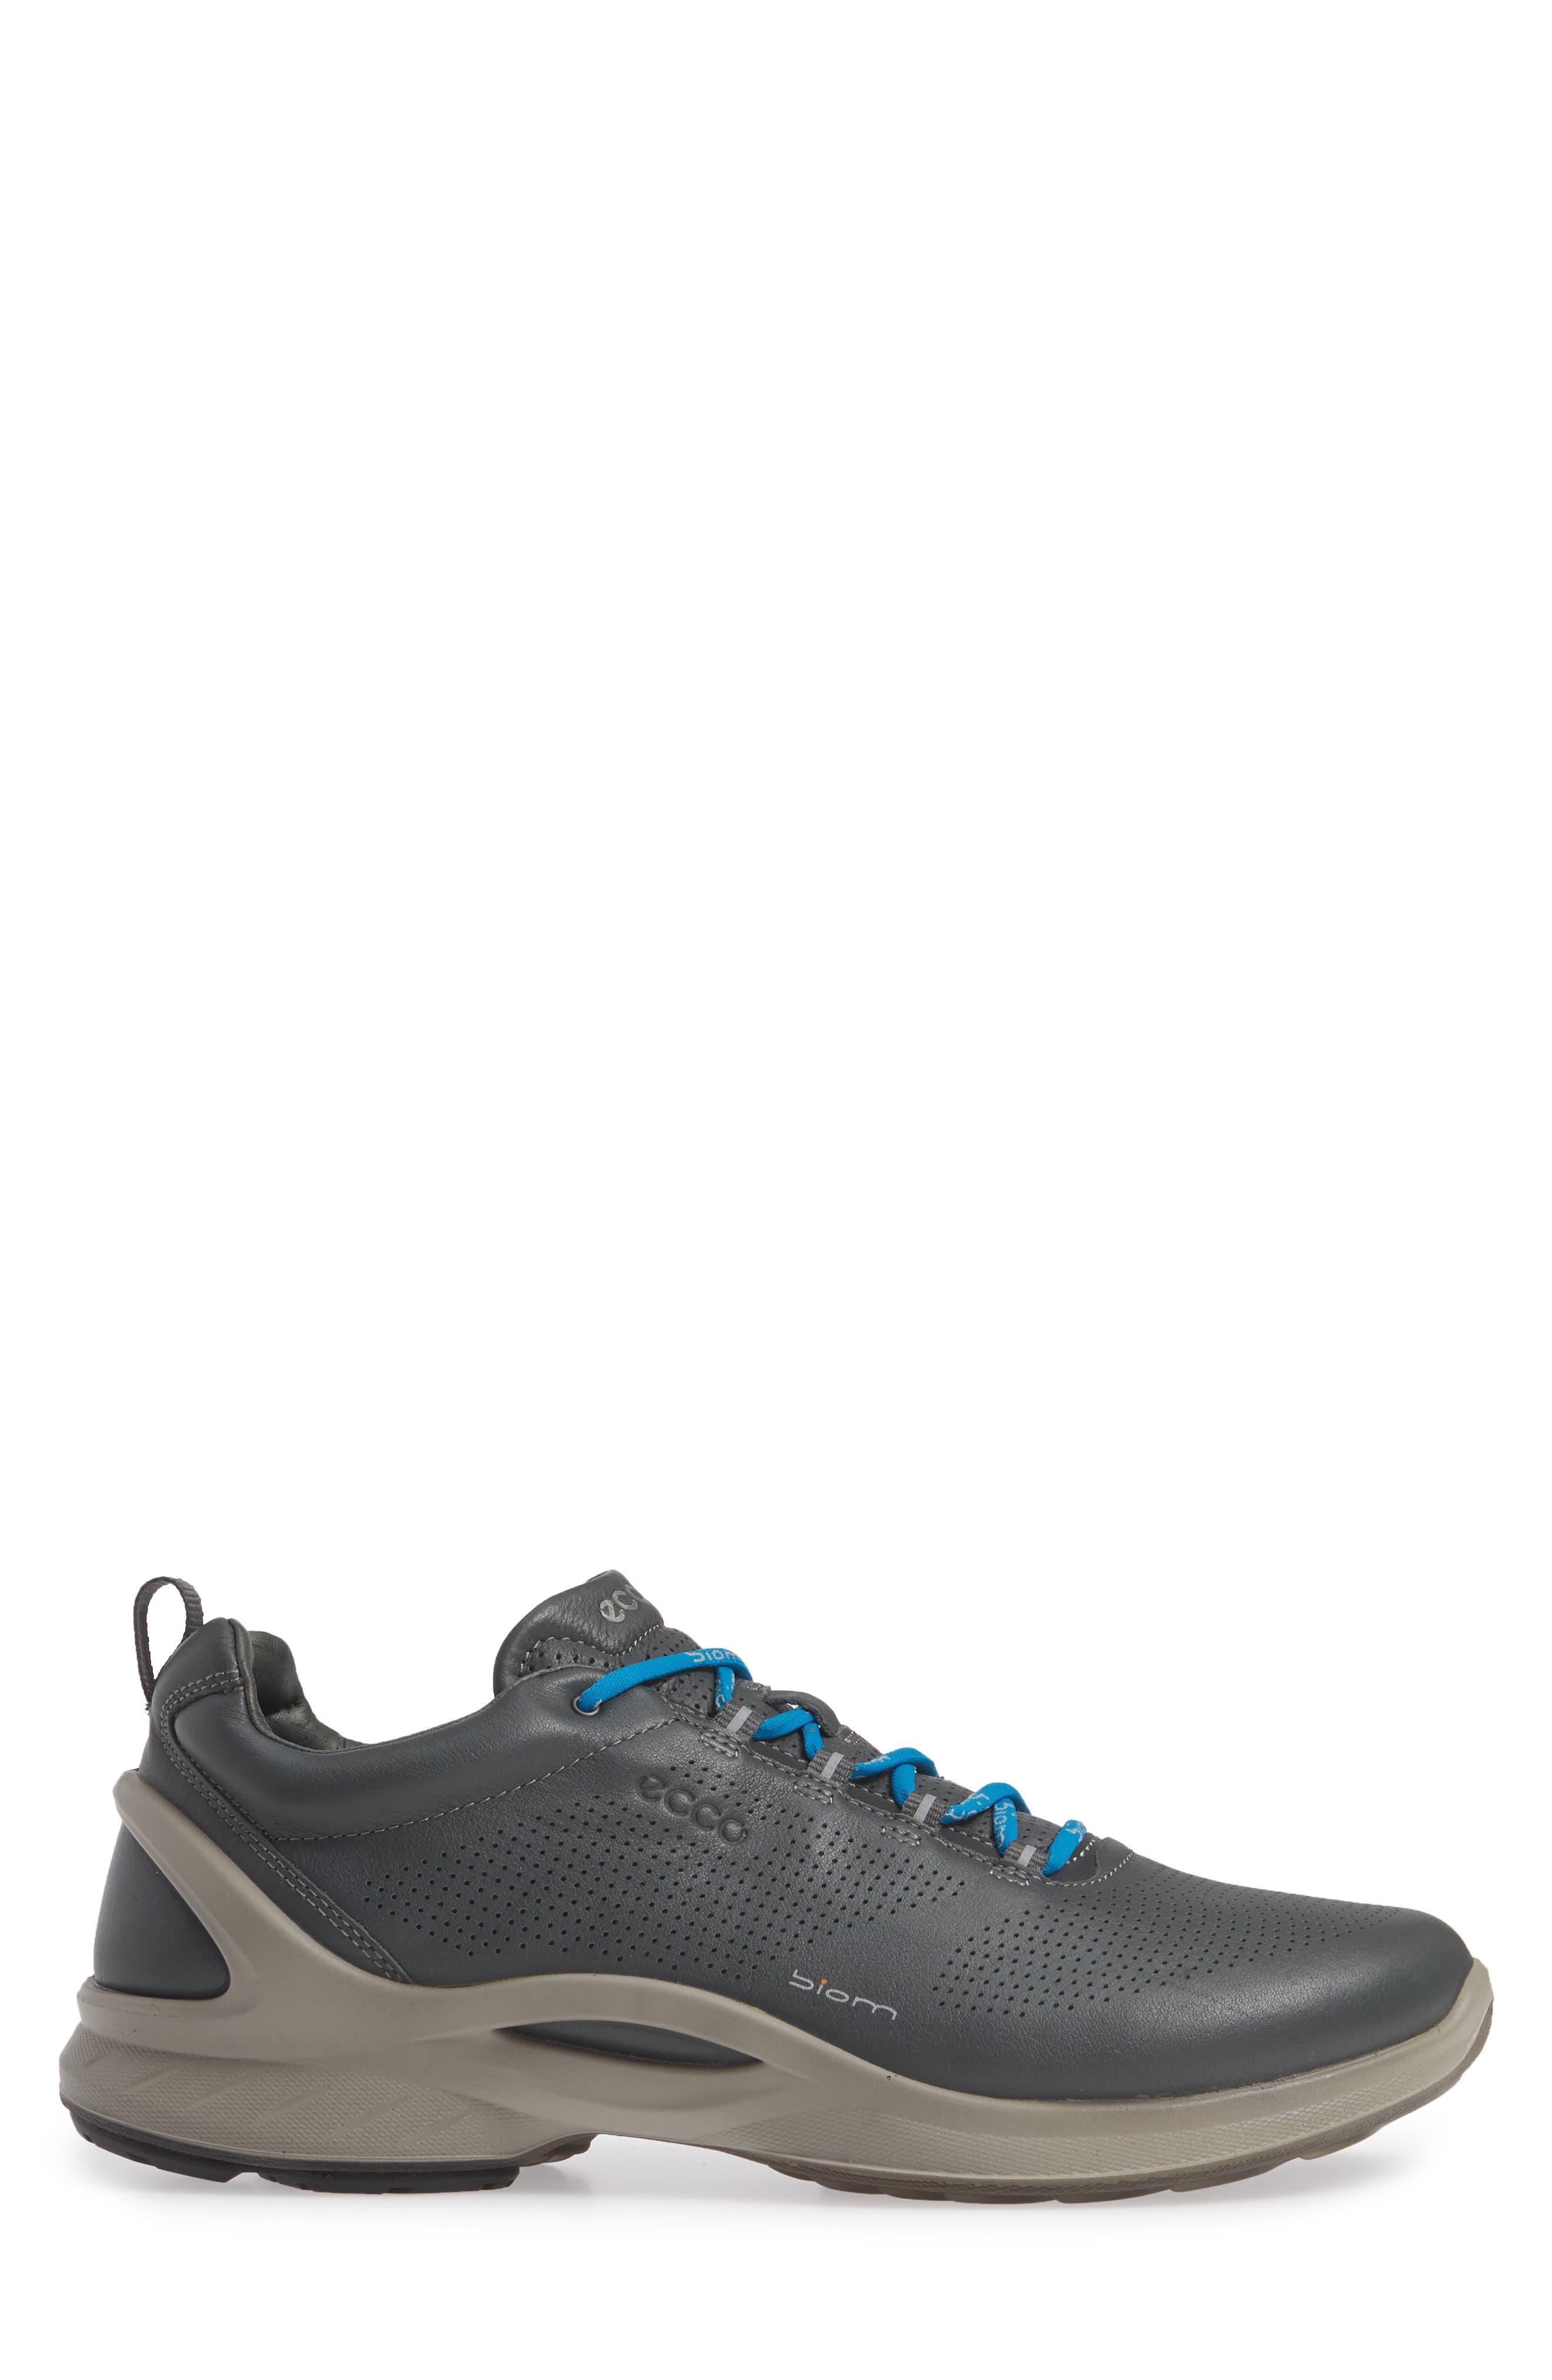 ECCO, 'BIOM Fjuel' Sneaker, Alternate thumbnail 3, color, DARK SHADOW LEATHER